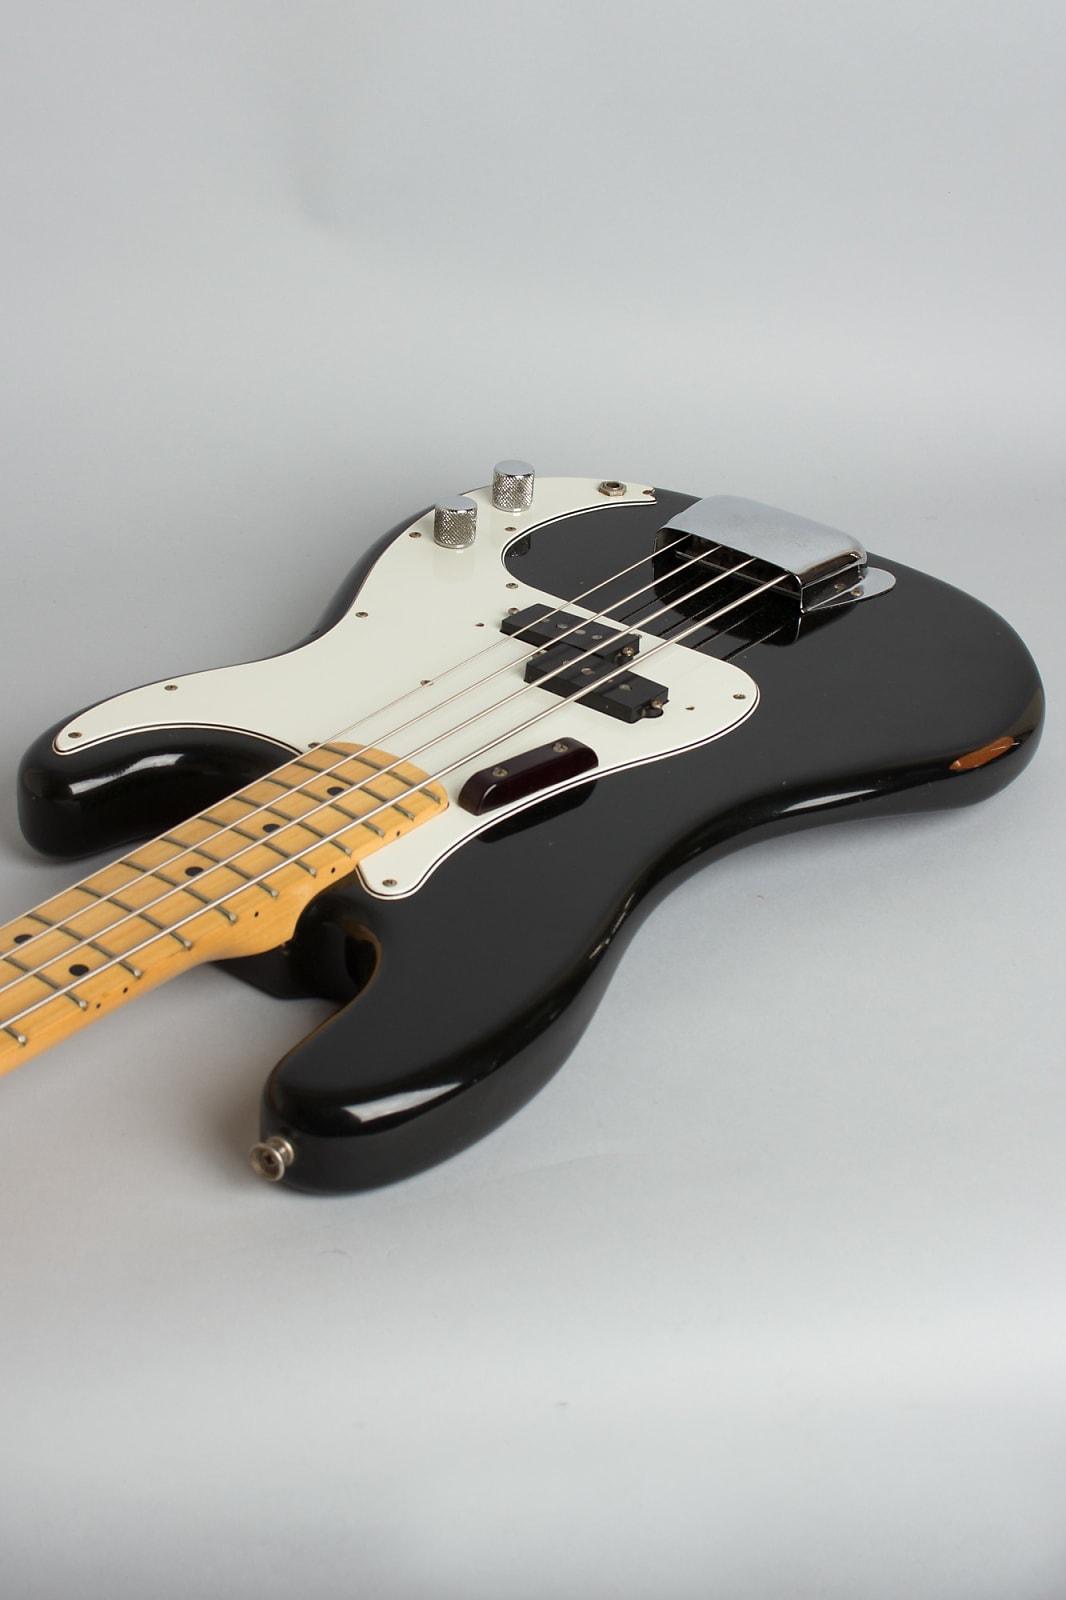 Fender  Precision Bass Solid Body Electric Bass Guitar (1975), ser. #635734, original black tolex hard shell case.